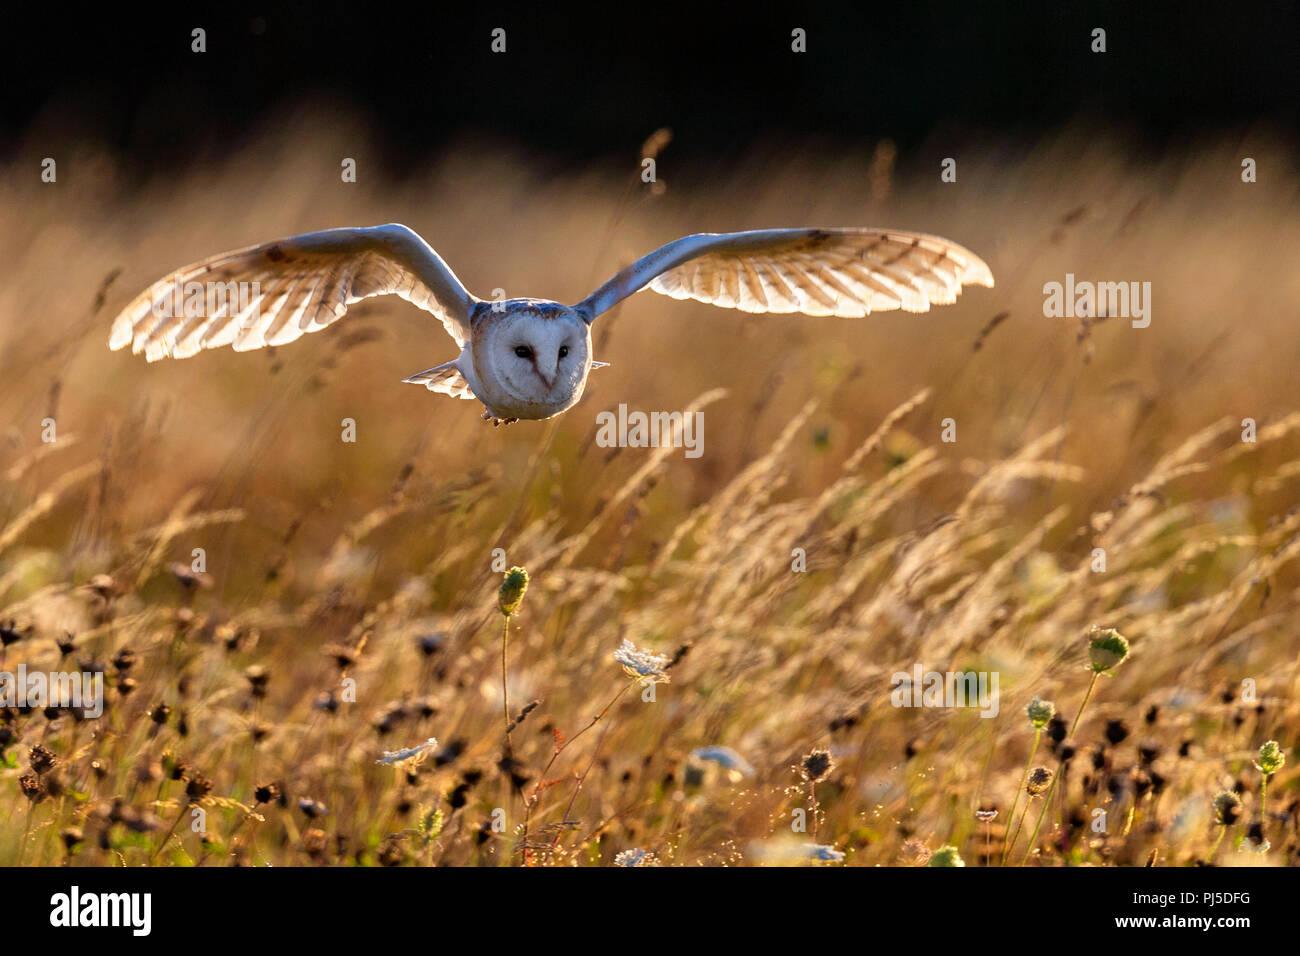 Lechuza en vuelo Imagen De Stock